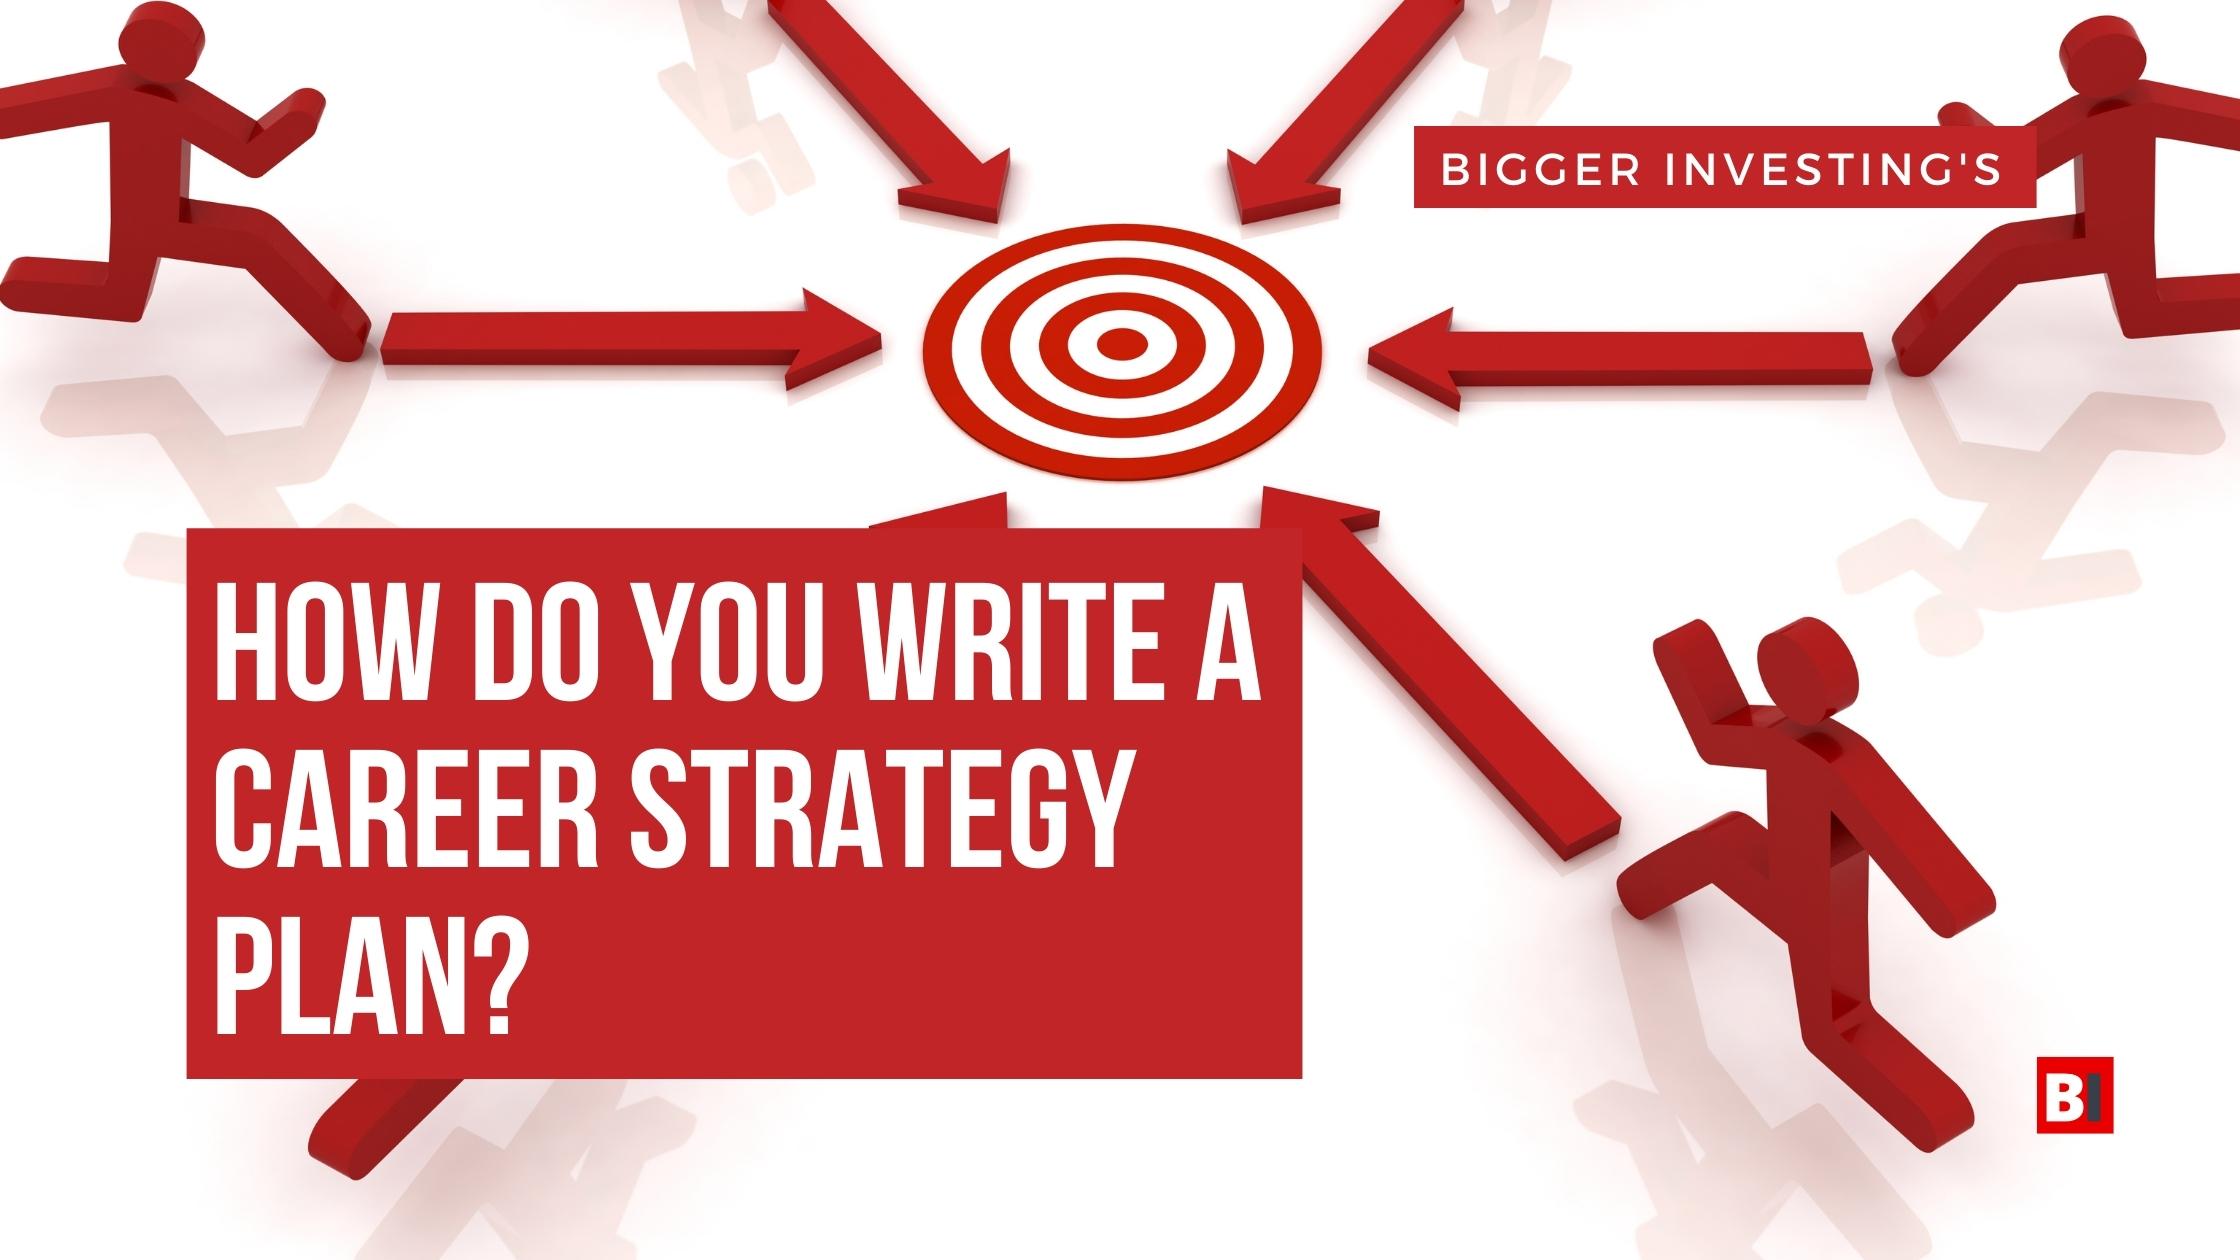 How Do You Write a Career Strategy Plan?